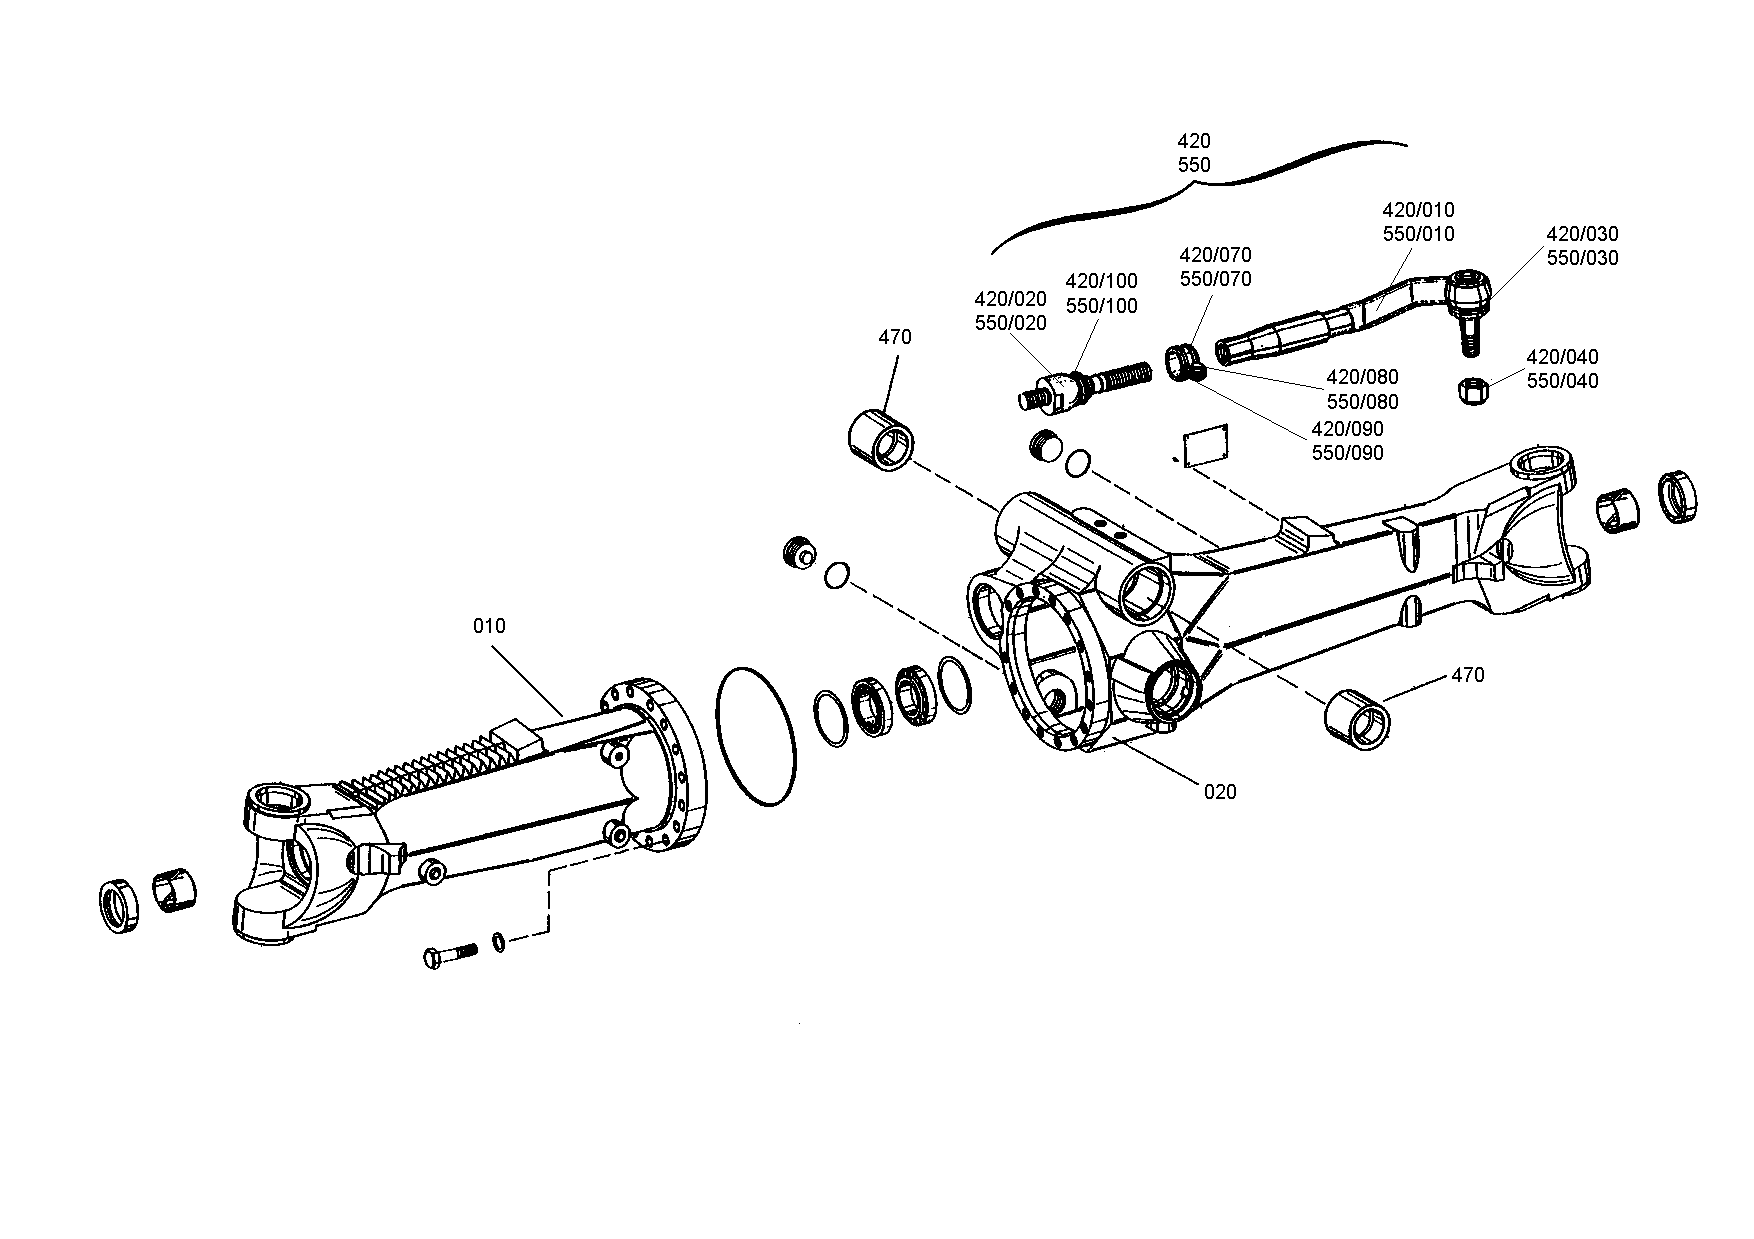 tags: #farmall h engine diagram#john deere 4010 engine cover#kawasaki mule  4010 engine diagram#john deere 4010 hydraulic pump diagram#john deere 430  engine